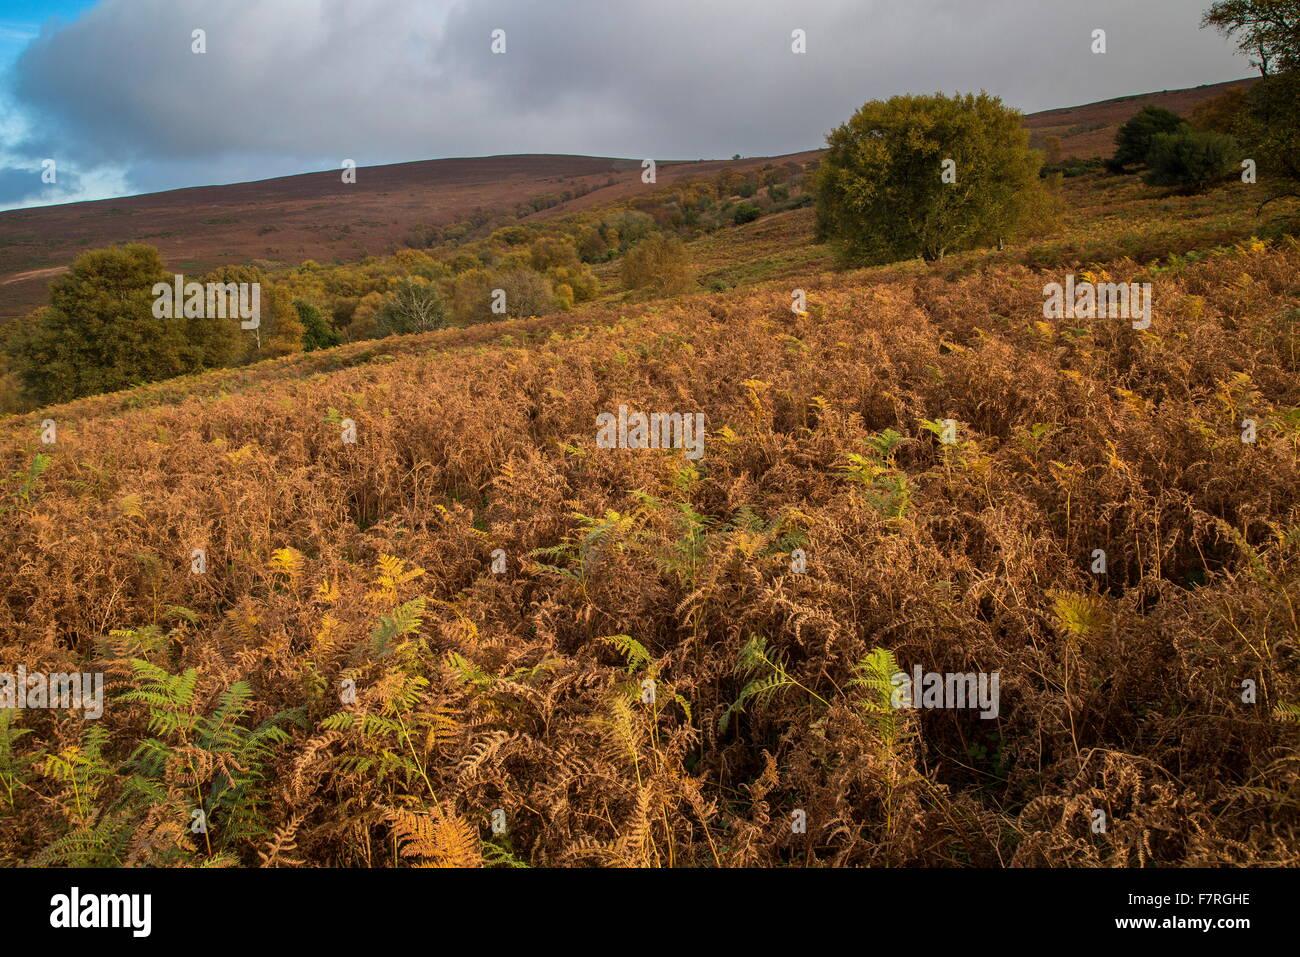 Mixed moorland habitats, with bracken on the north slopes of Dunkery Beacon, Exmoor. Somerset. - Stock Image